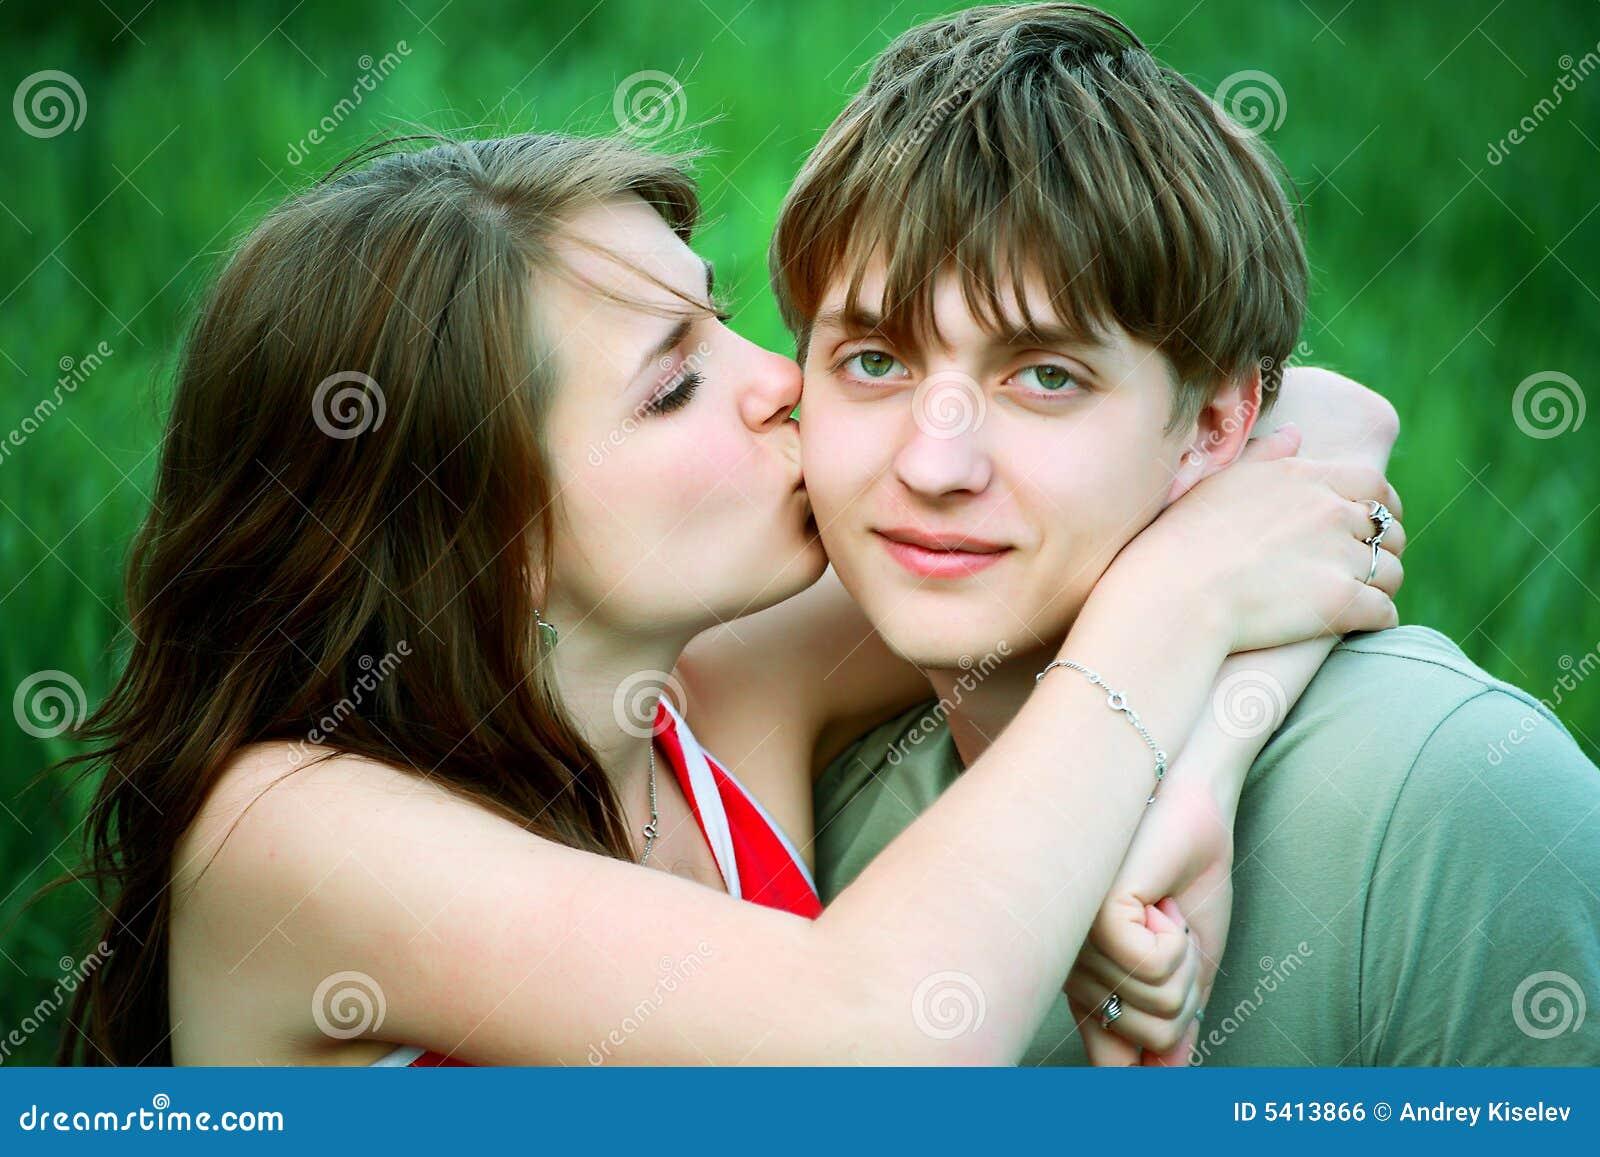 Kiss tender